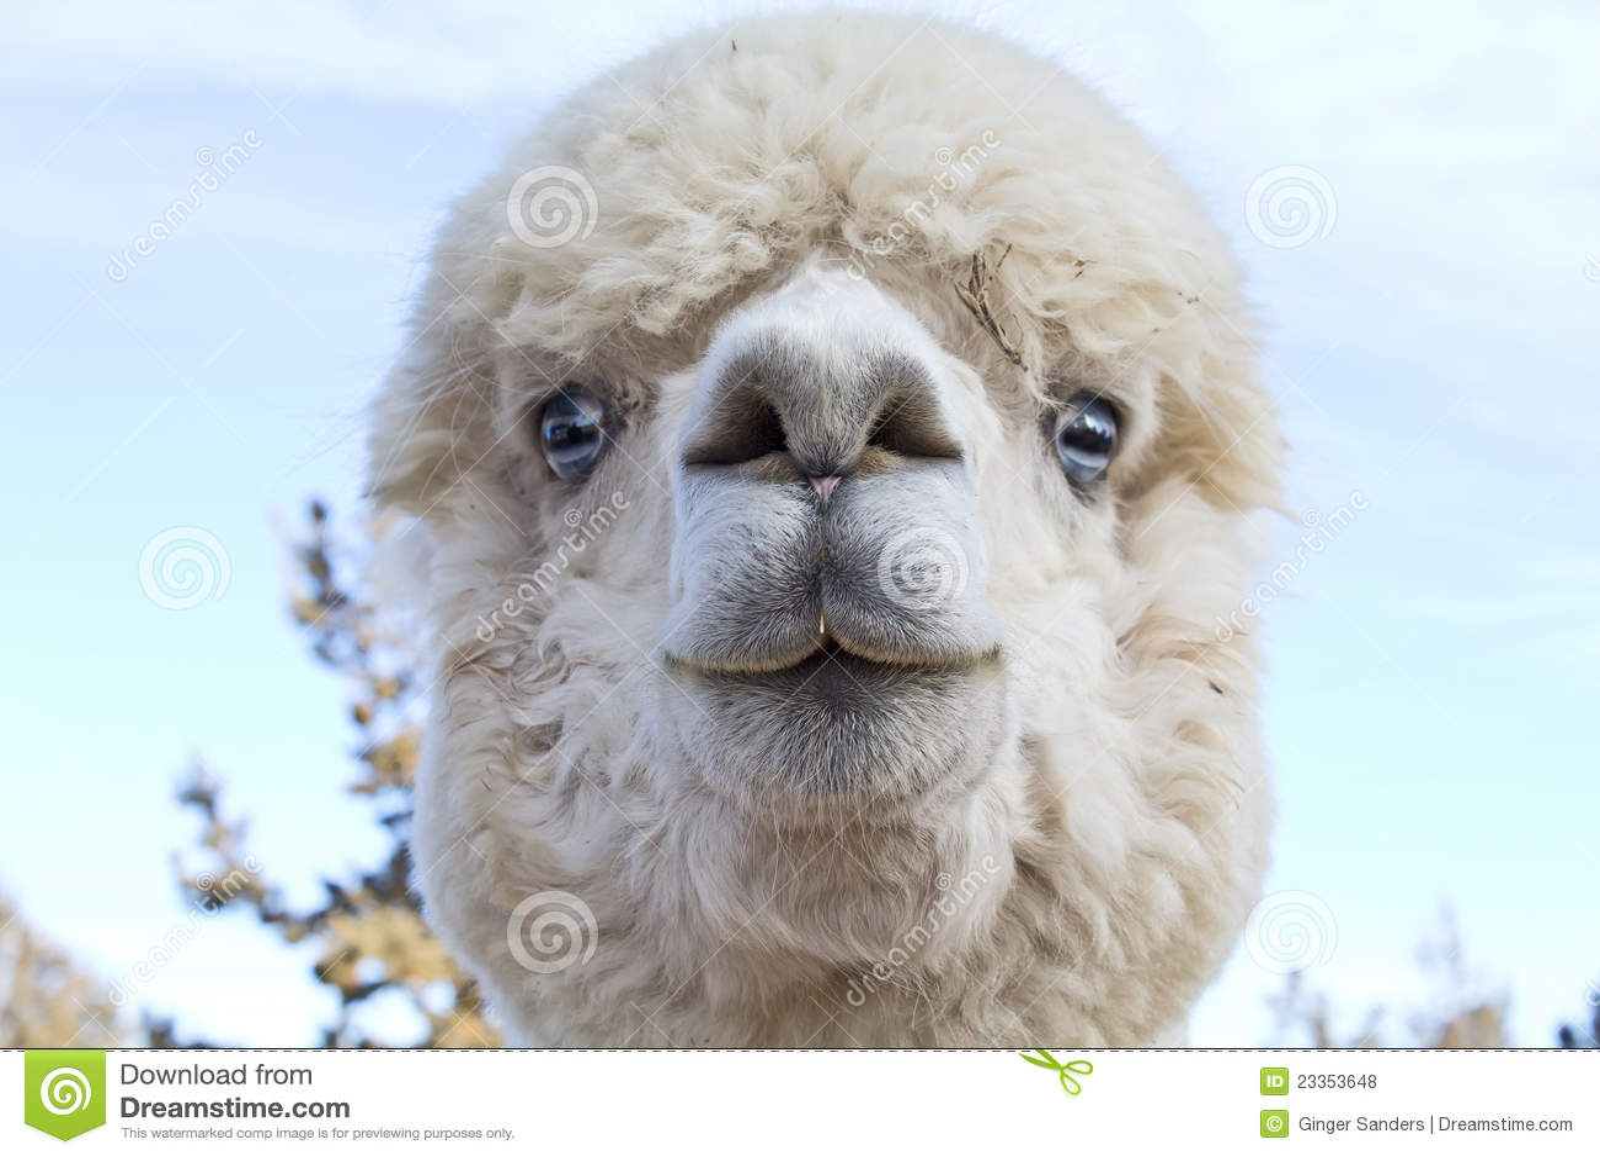 funny face white alpaca close up royalty free stock photos